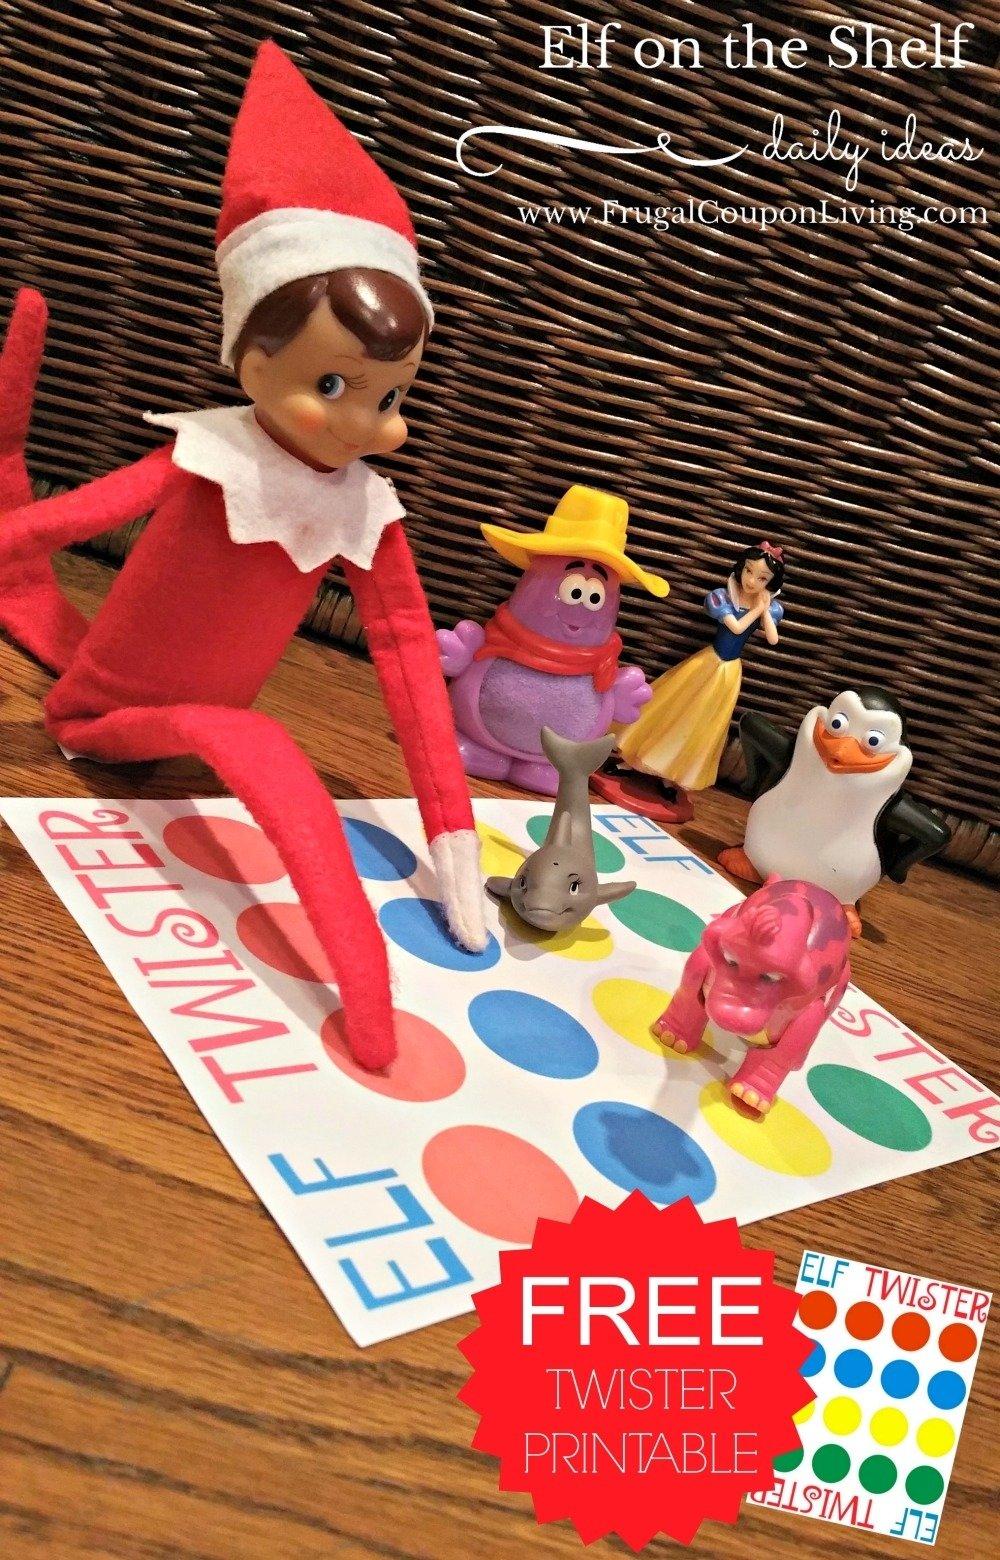 10 Lovely Elf On The Shelf Mischievous Ideas 21 mischievous elf on the shelf ideas to delight the kids 1 2020